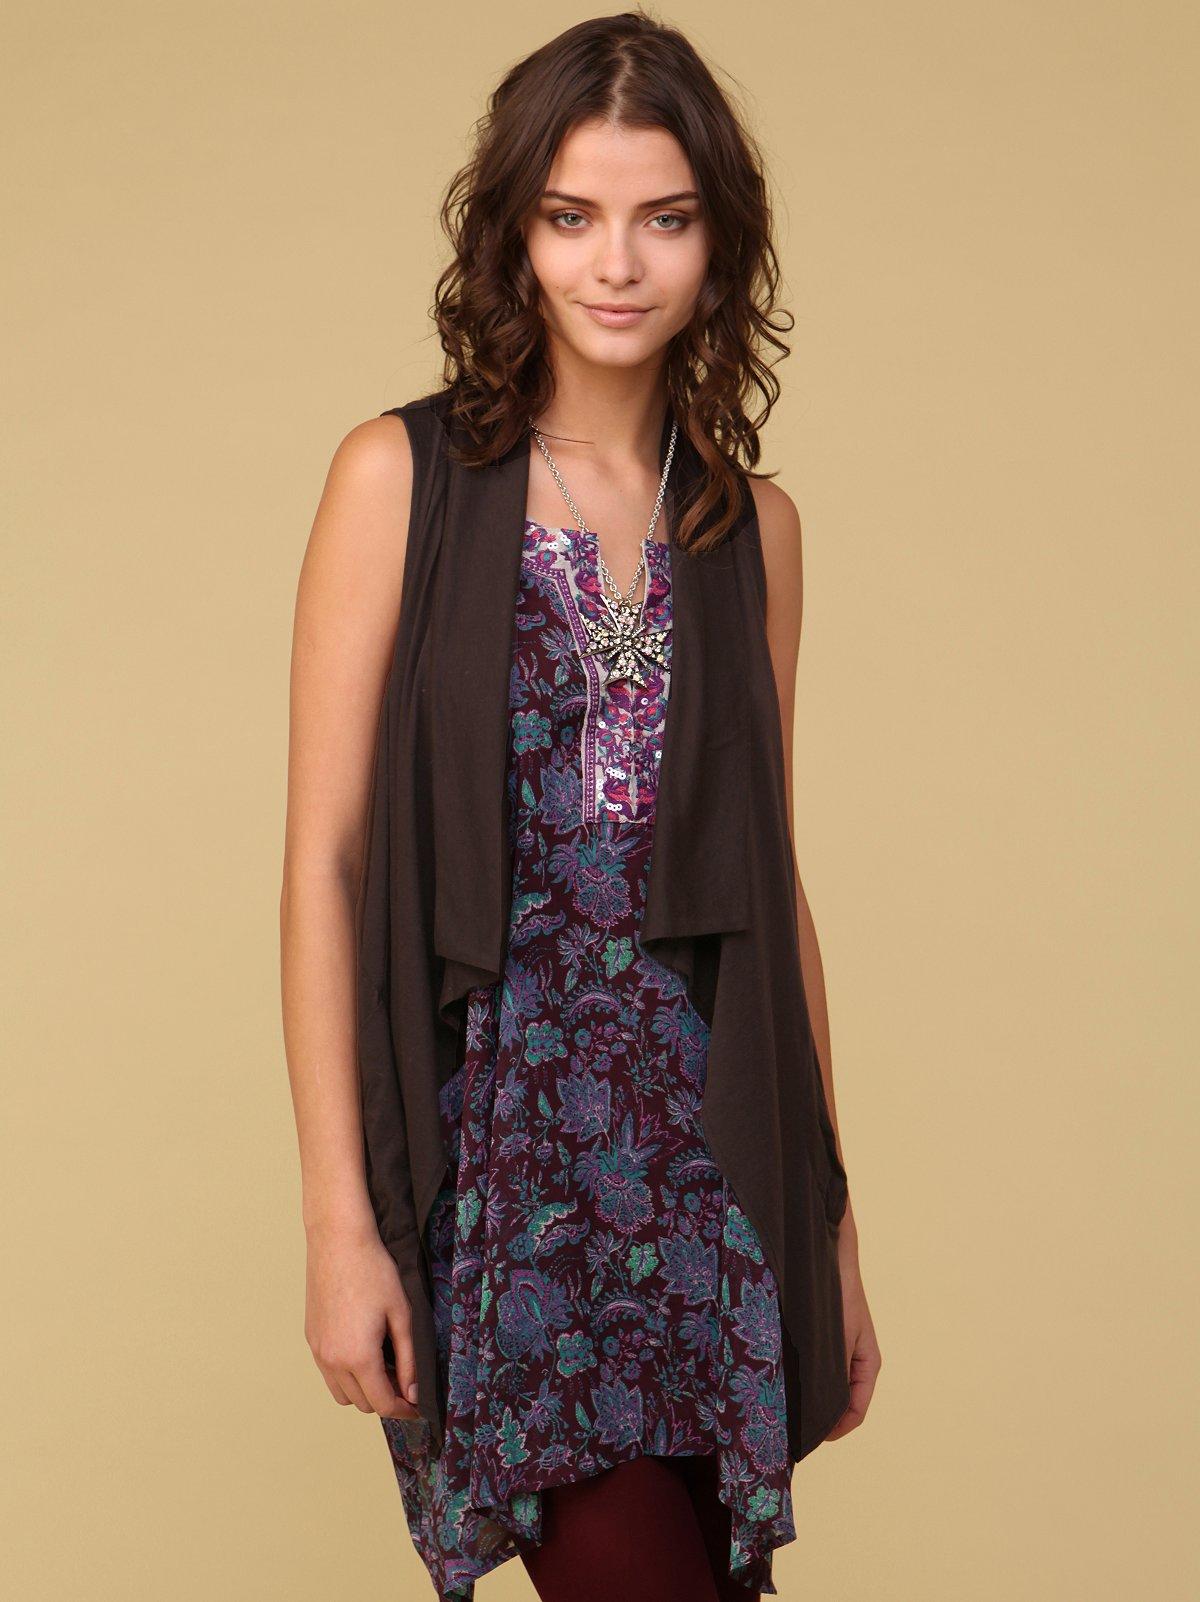 Drippy Knit Vest